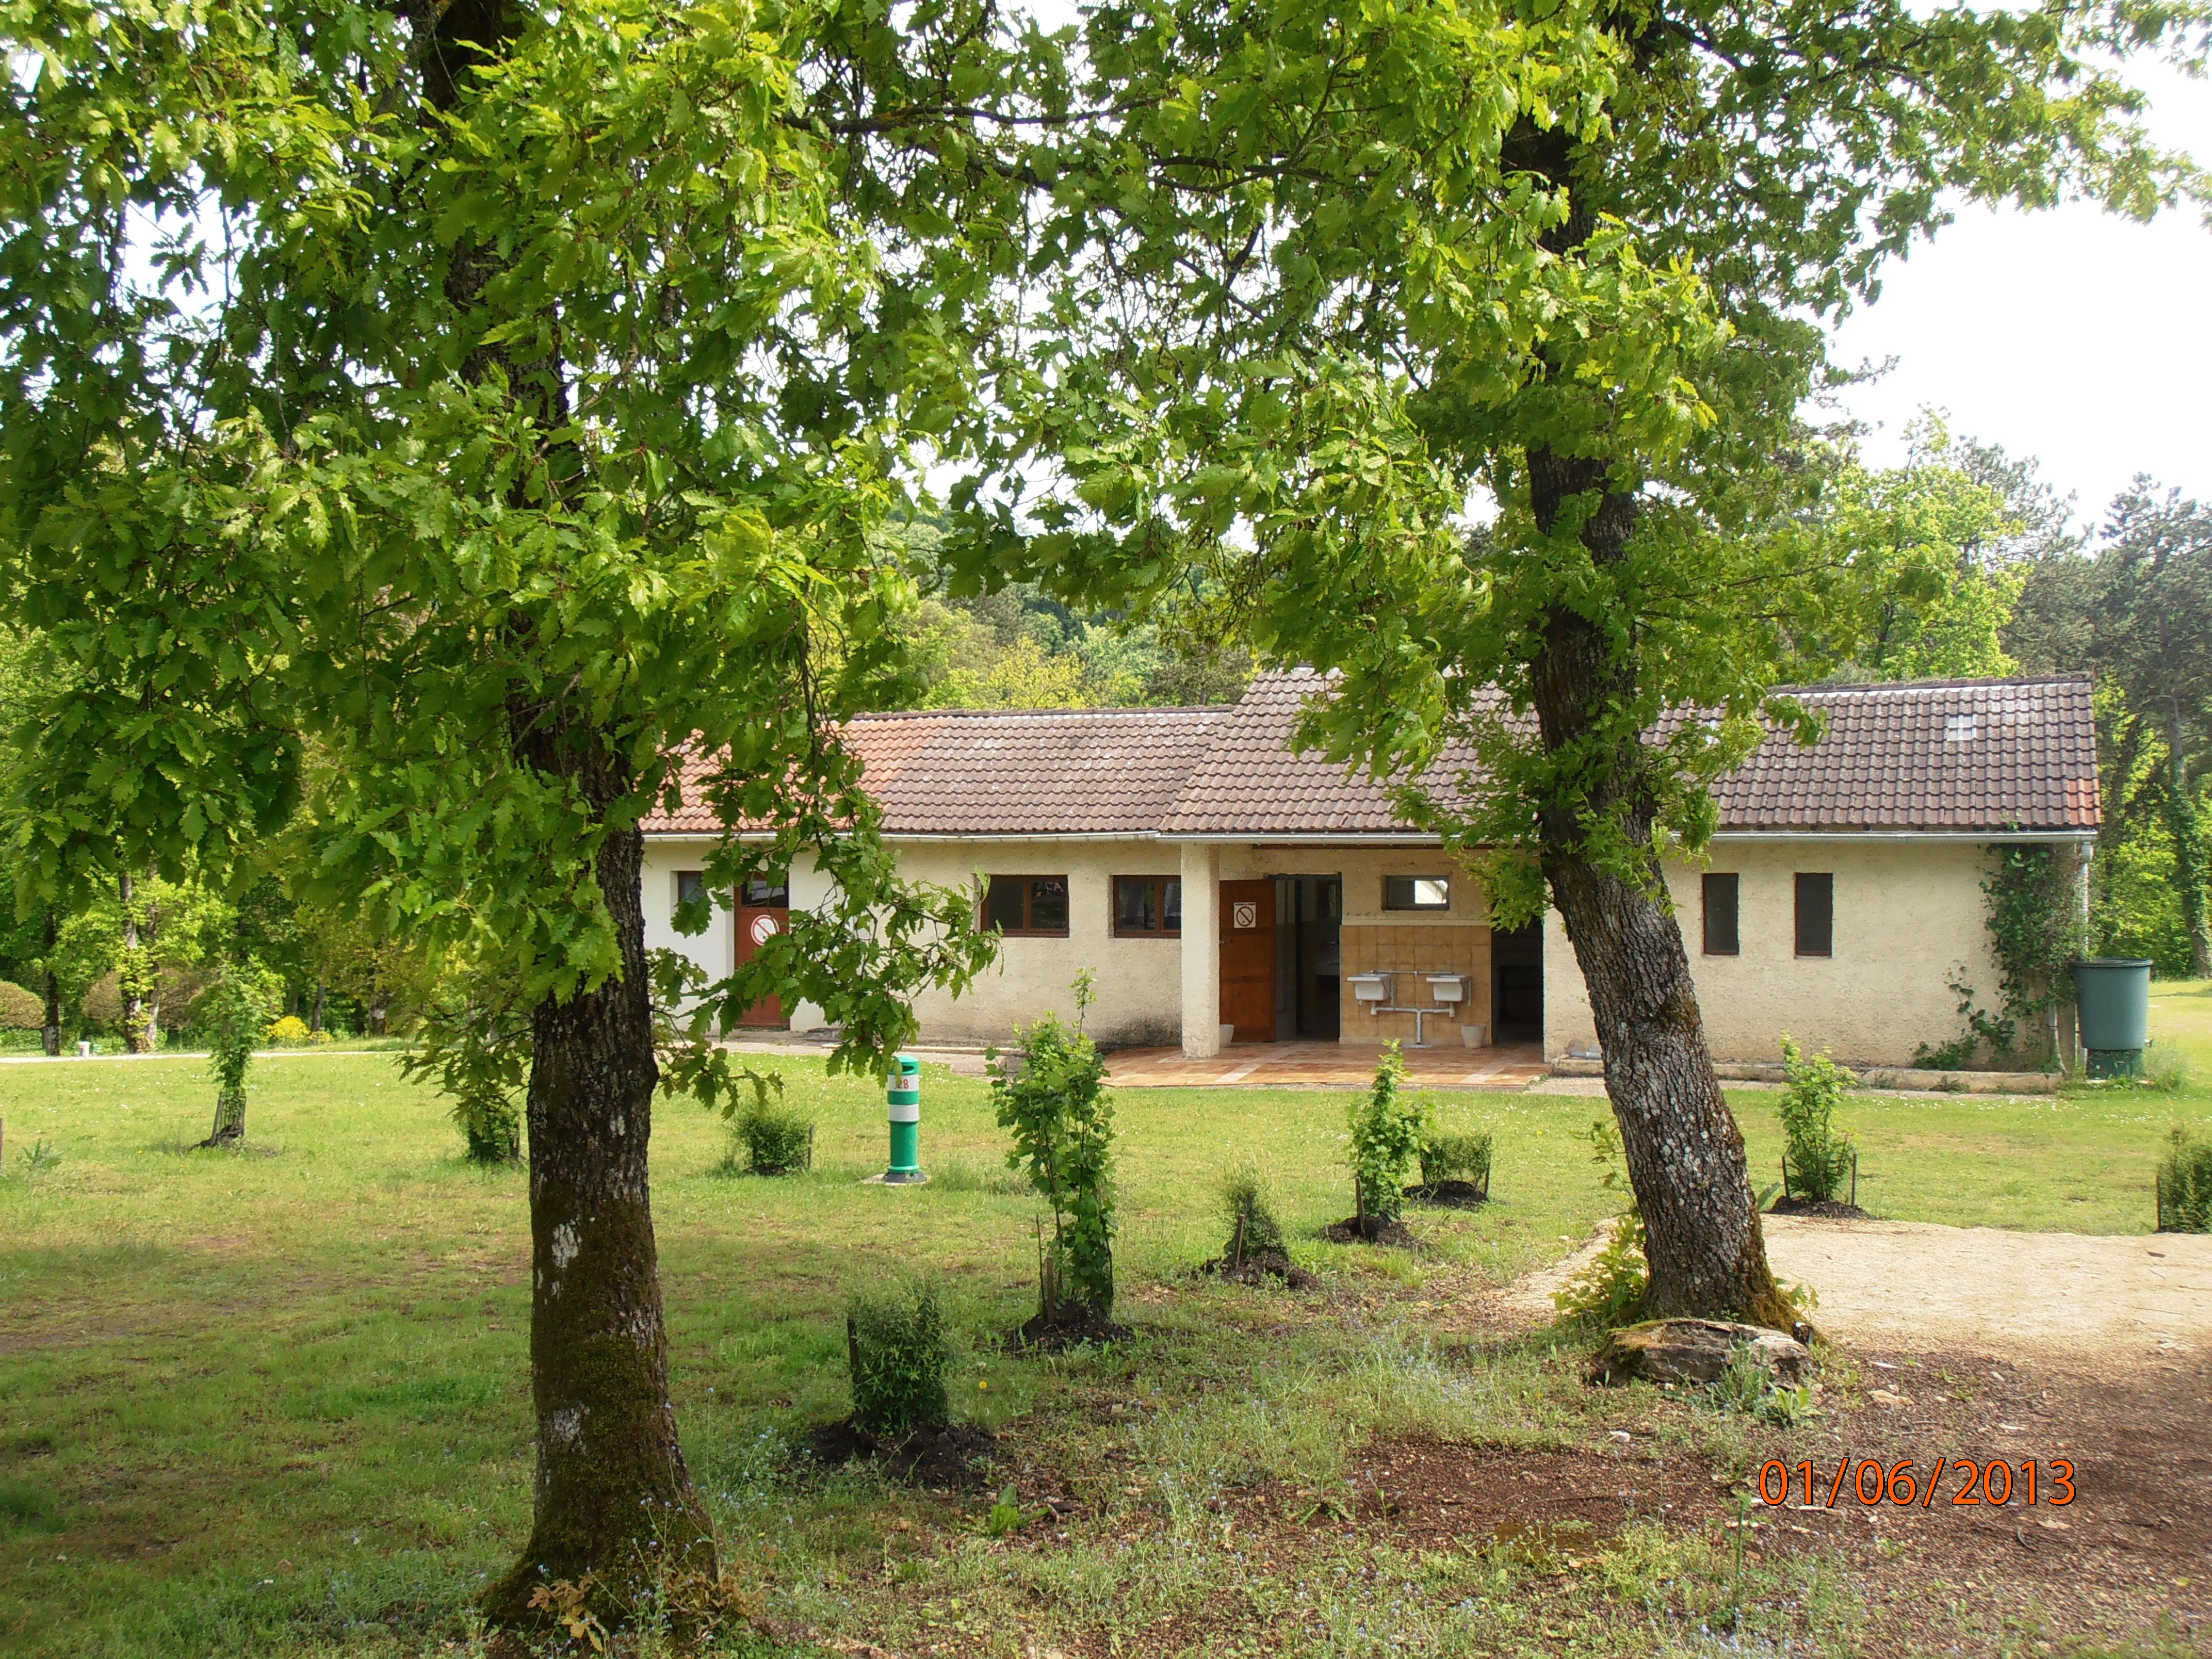 Camping la Pelouse, Jaulny, Meurthe-et-Moselle